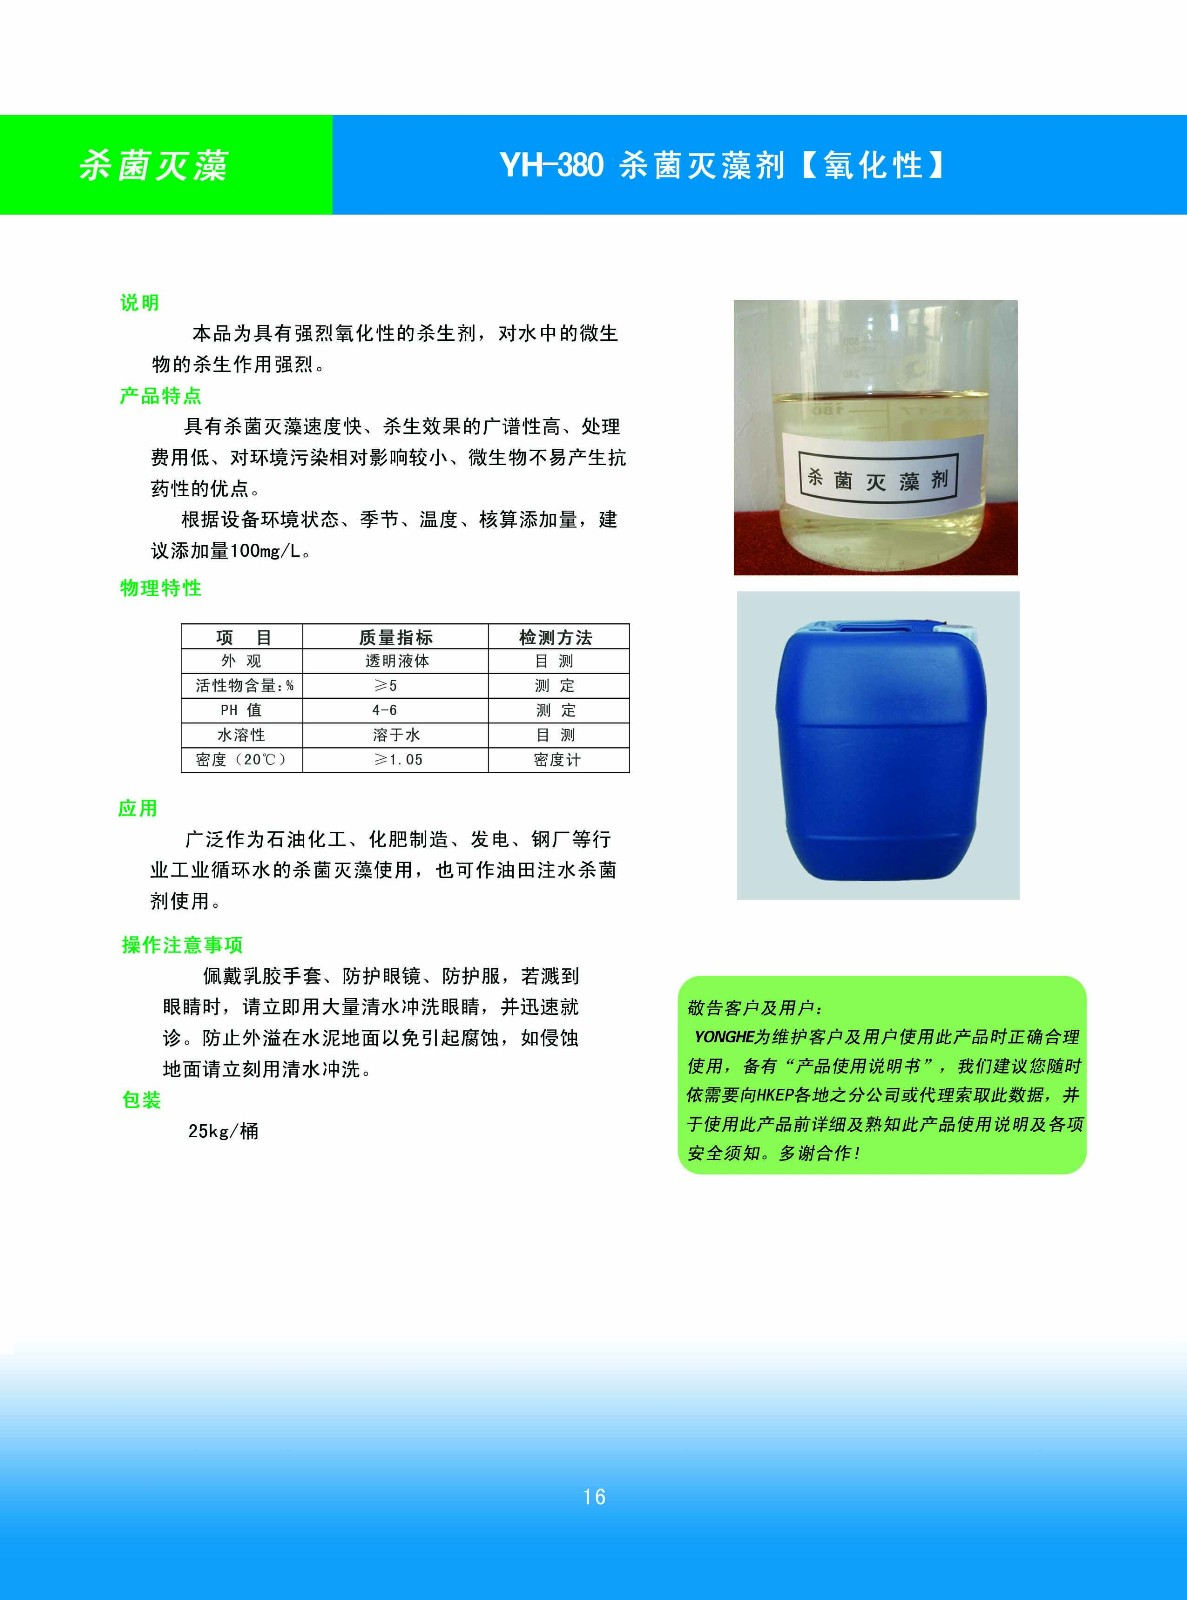 16  YH-380 氧化性殺菌滅藻劑.jpg